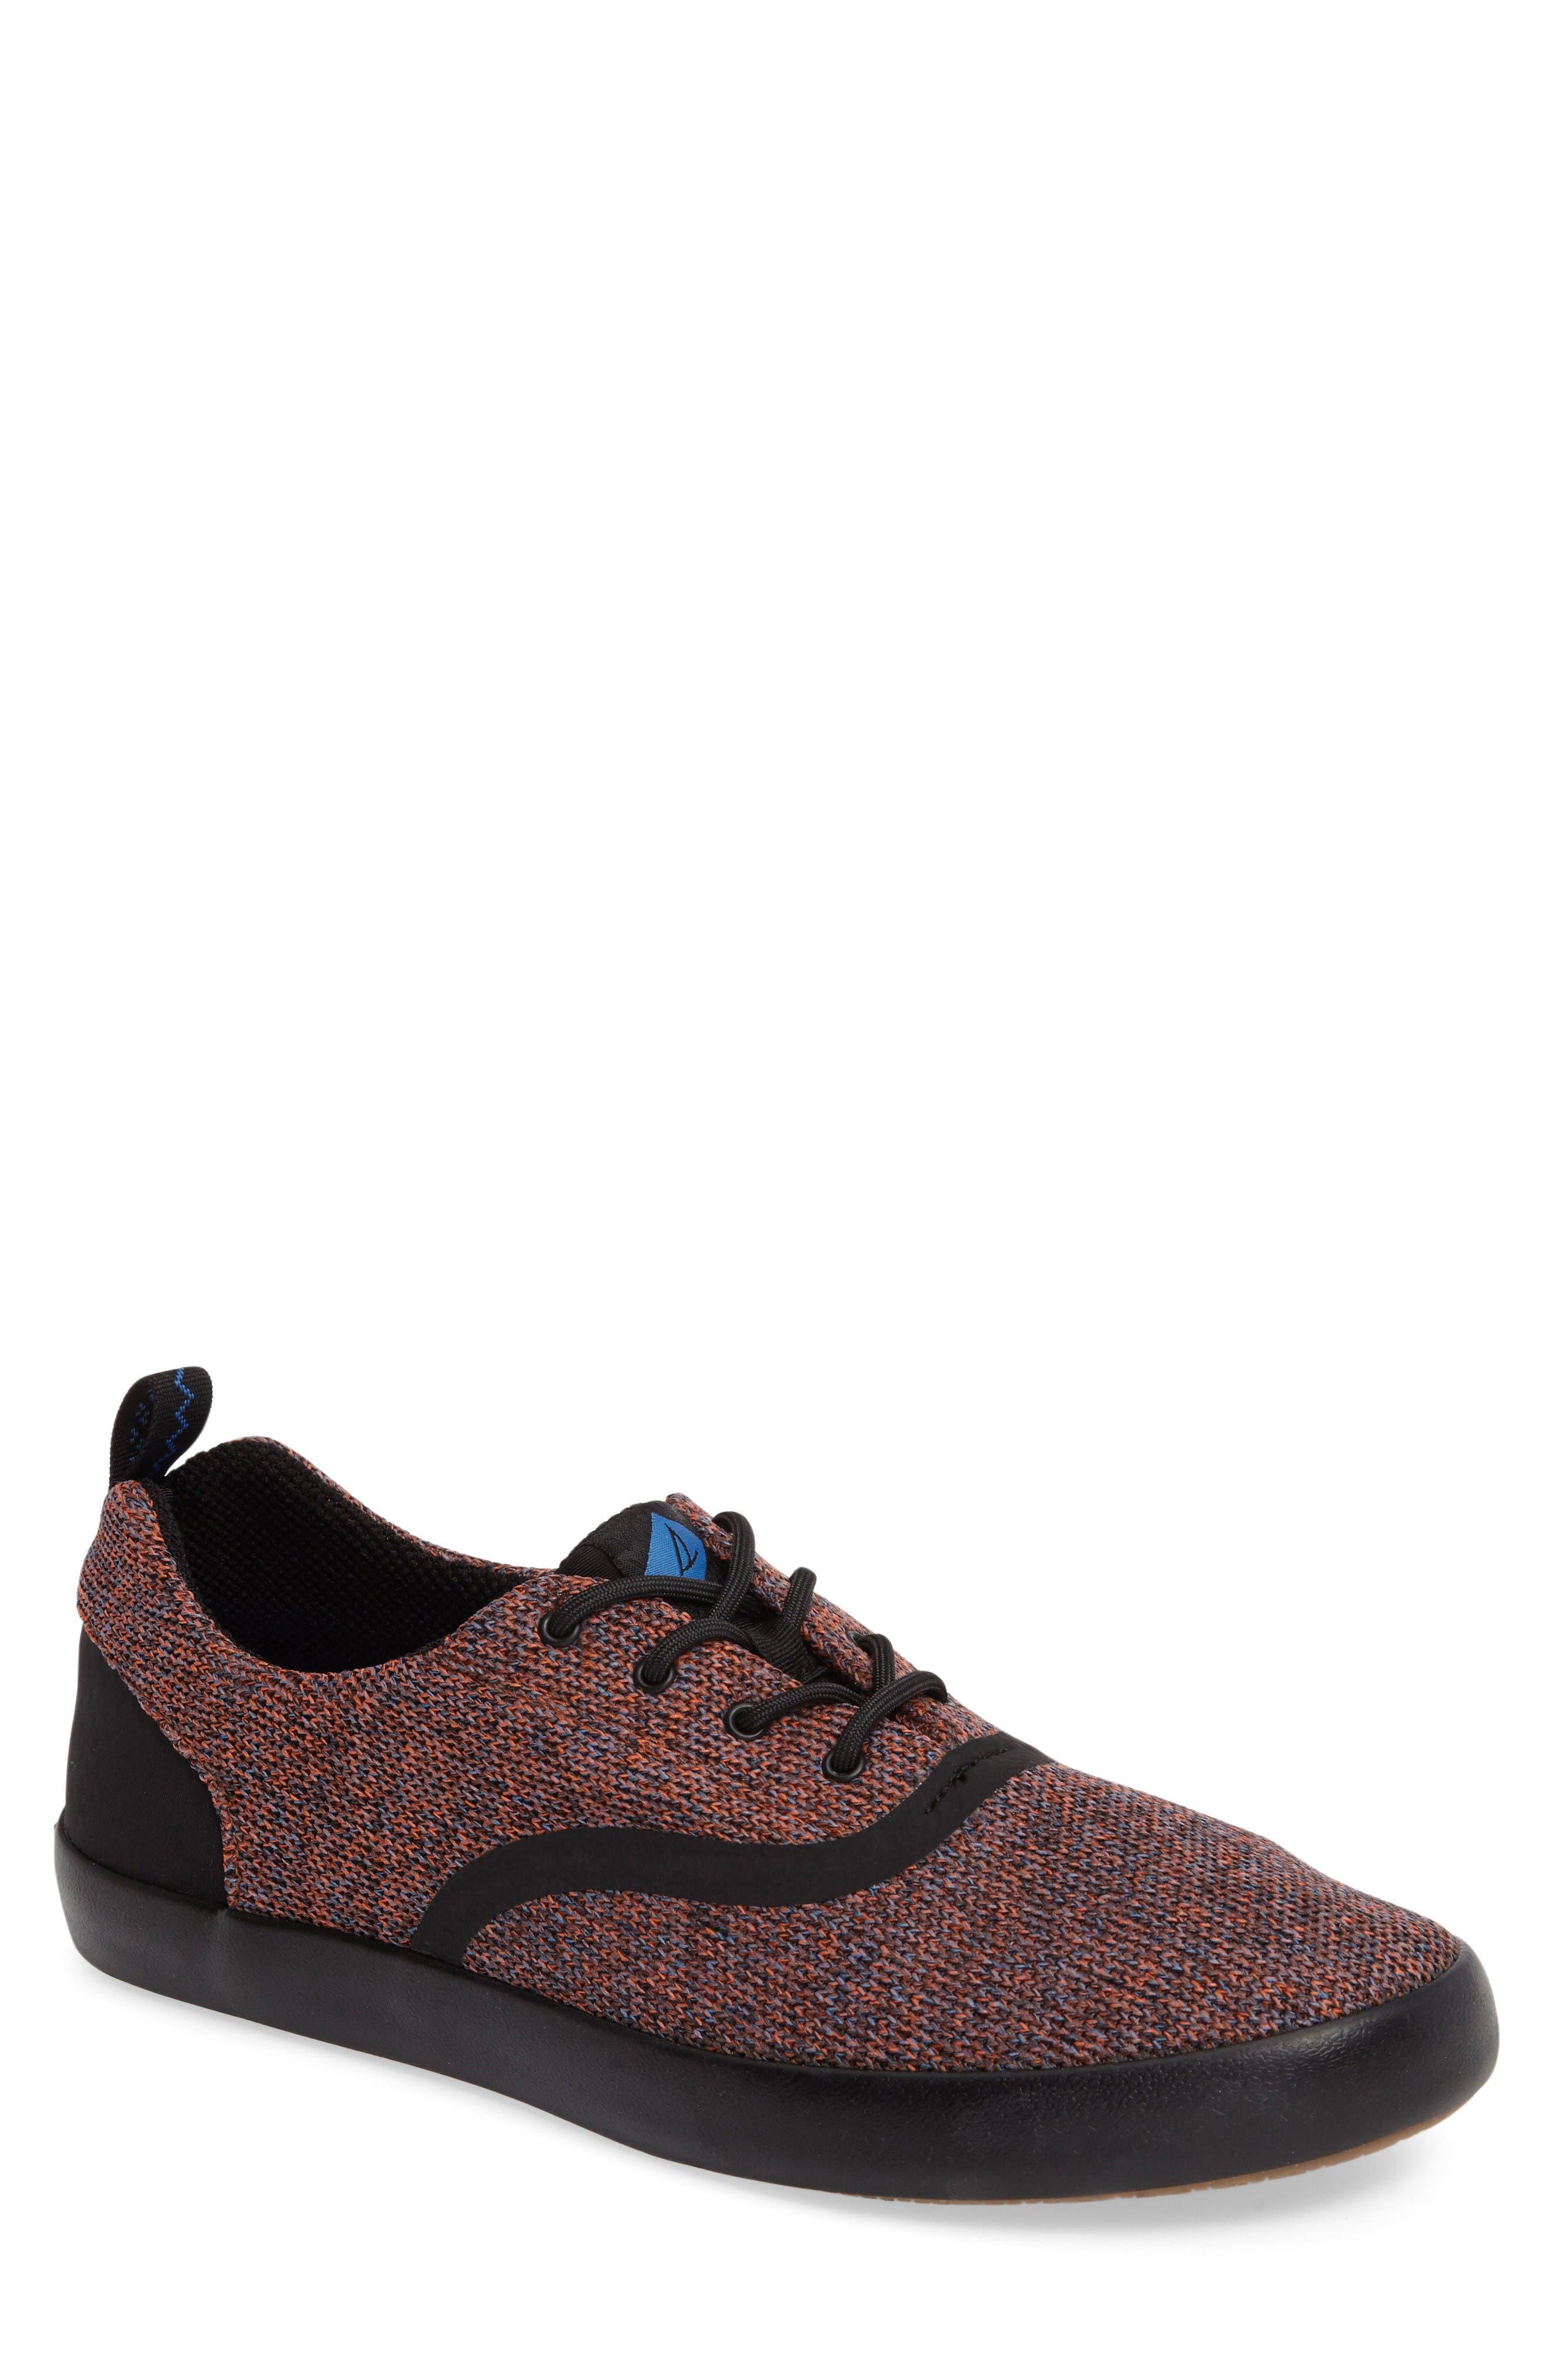 Alternate Image 1 Selected - Paul Sperry Flex Deck Sneaker (Men)